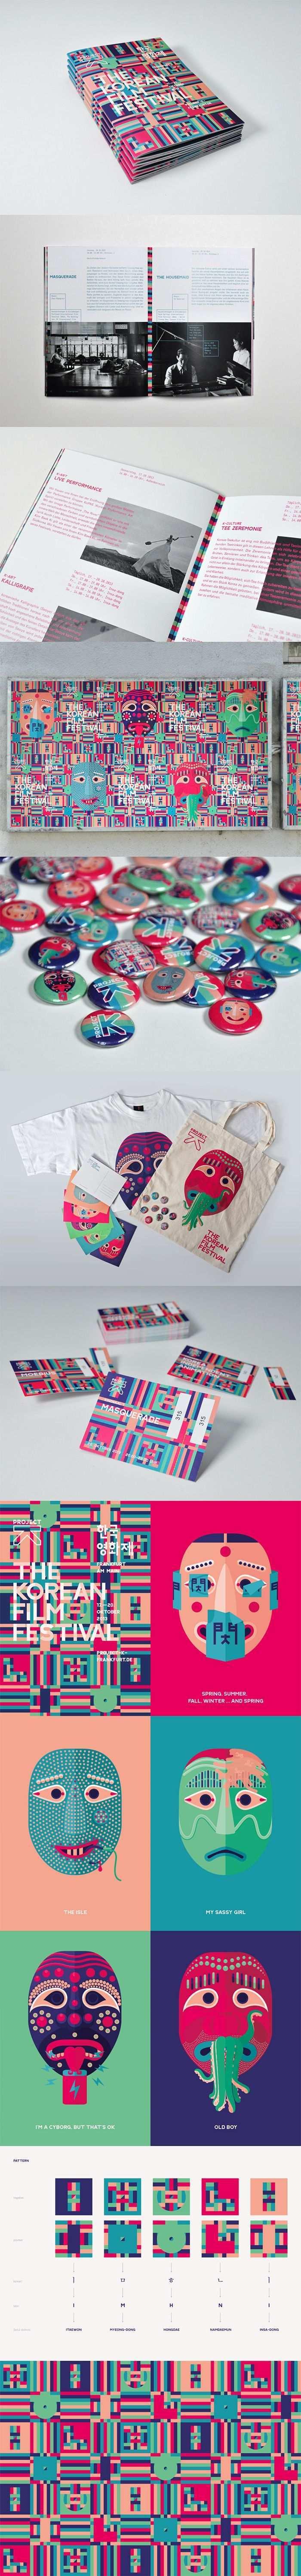 Project K The Korean Film Festival Festival Kampagne 2013 Grafik Design Magazin Design Grafik Design Logos